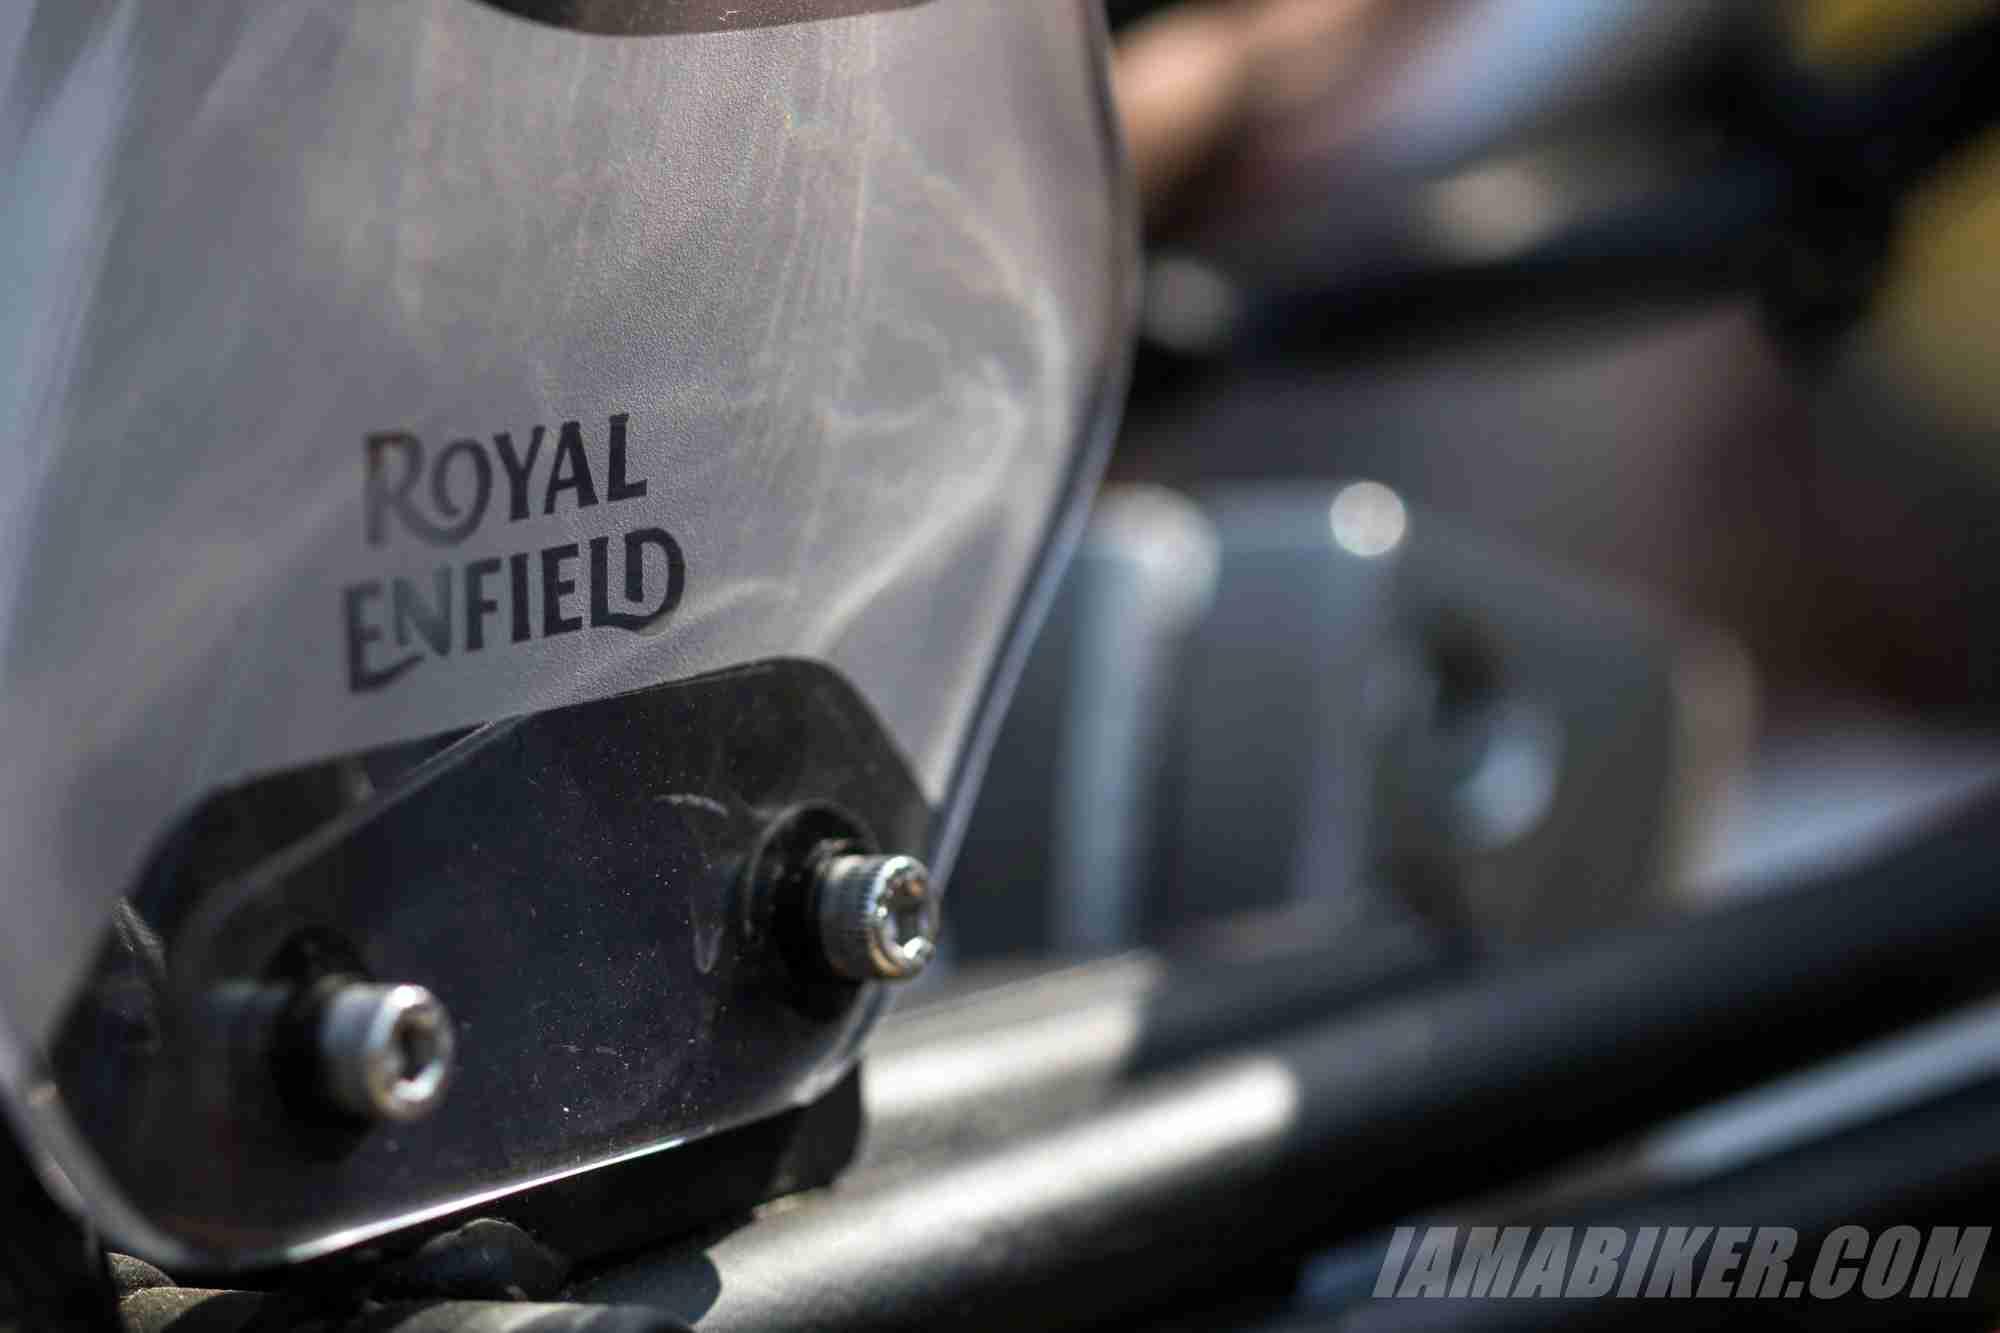 Royal Enfield Himalayan branding